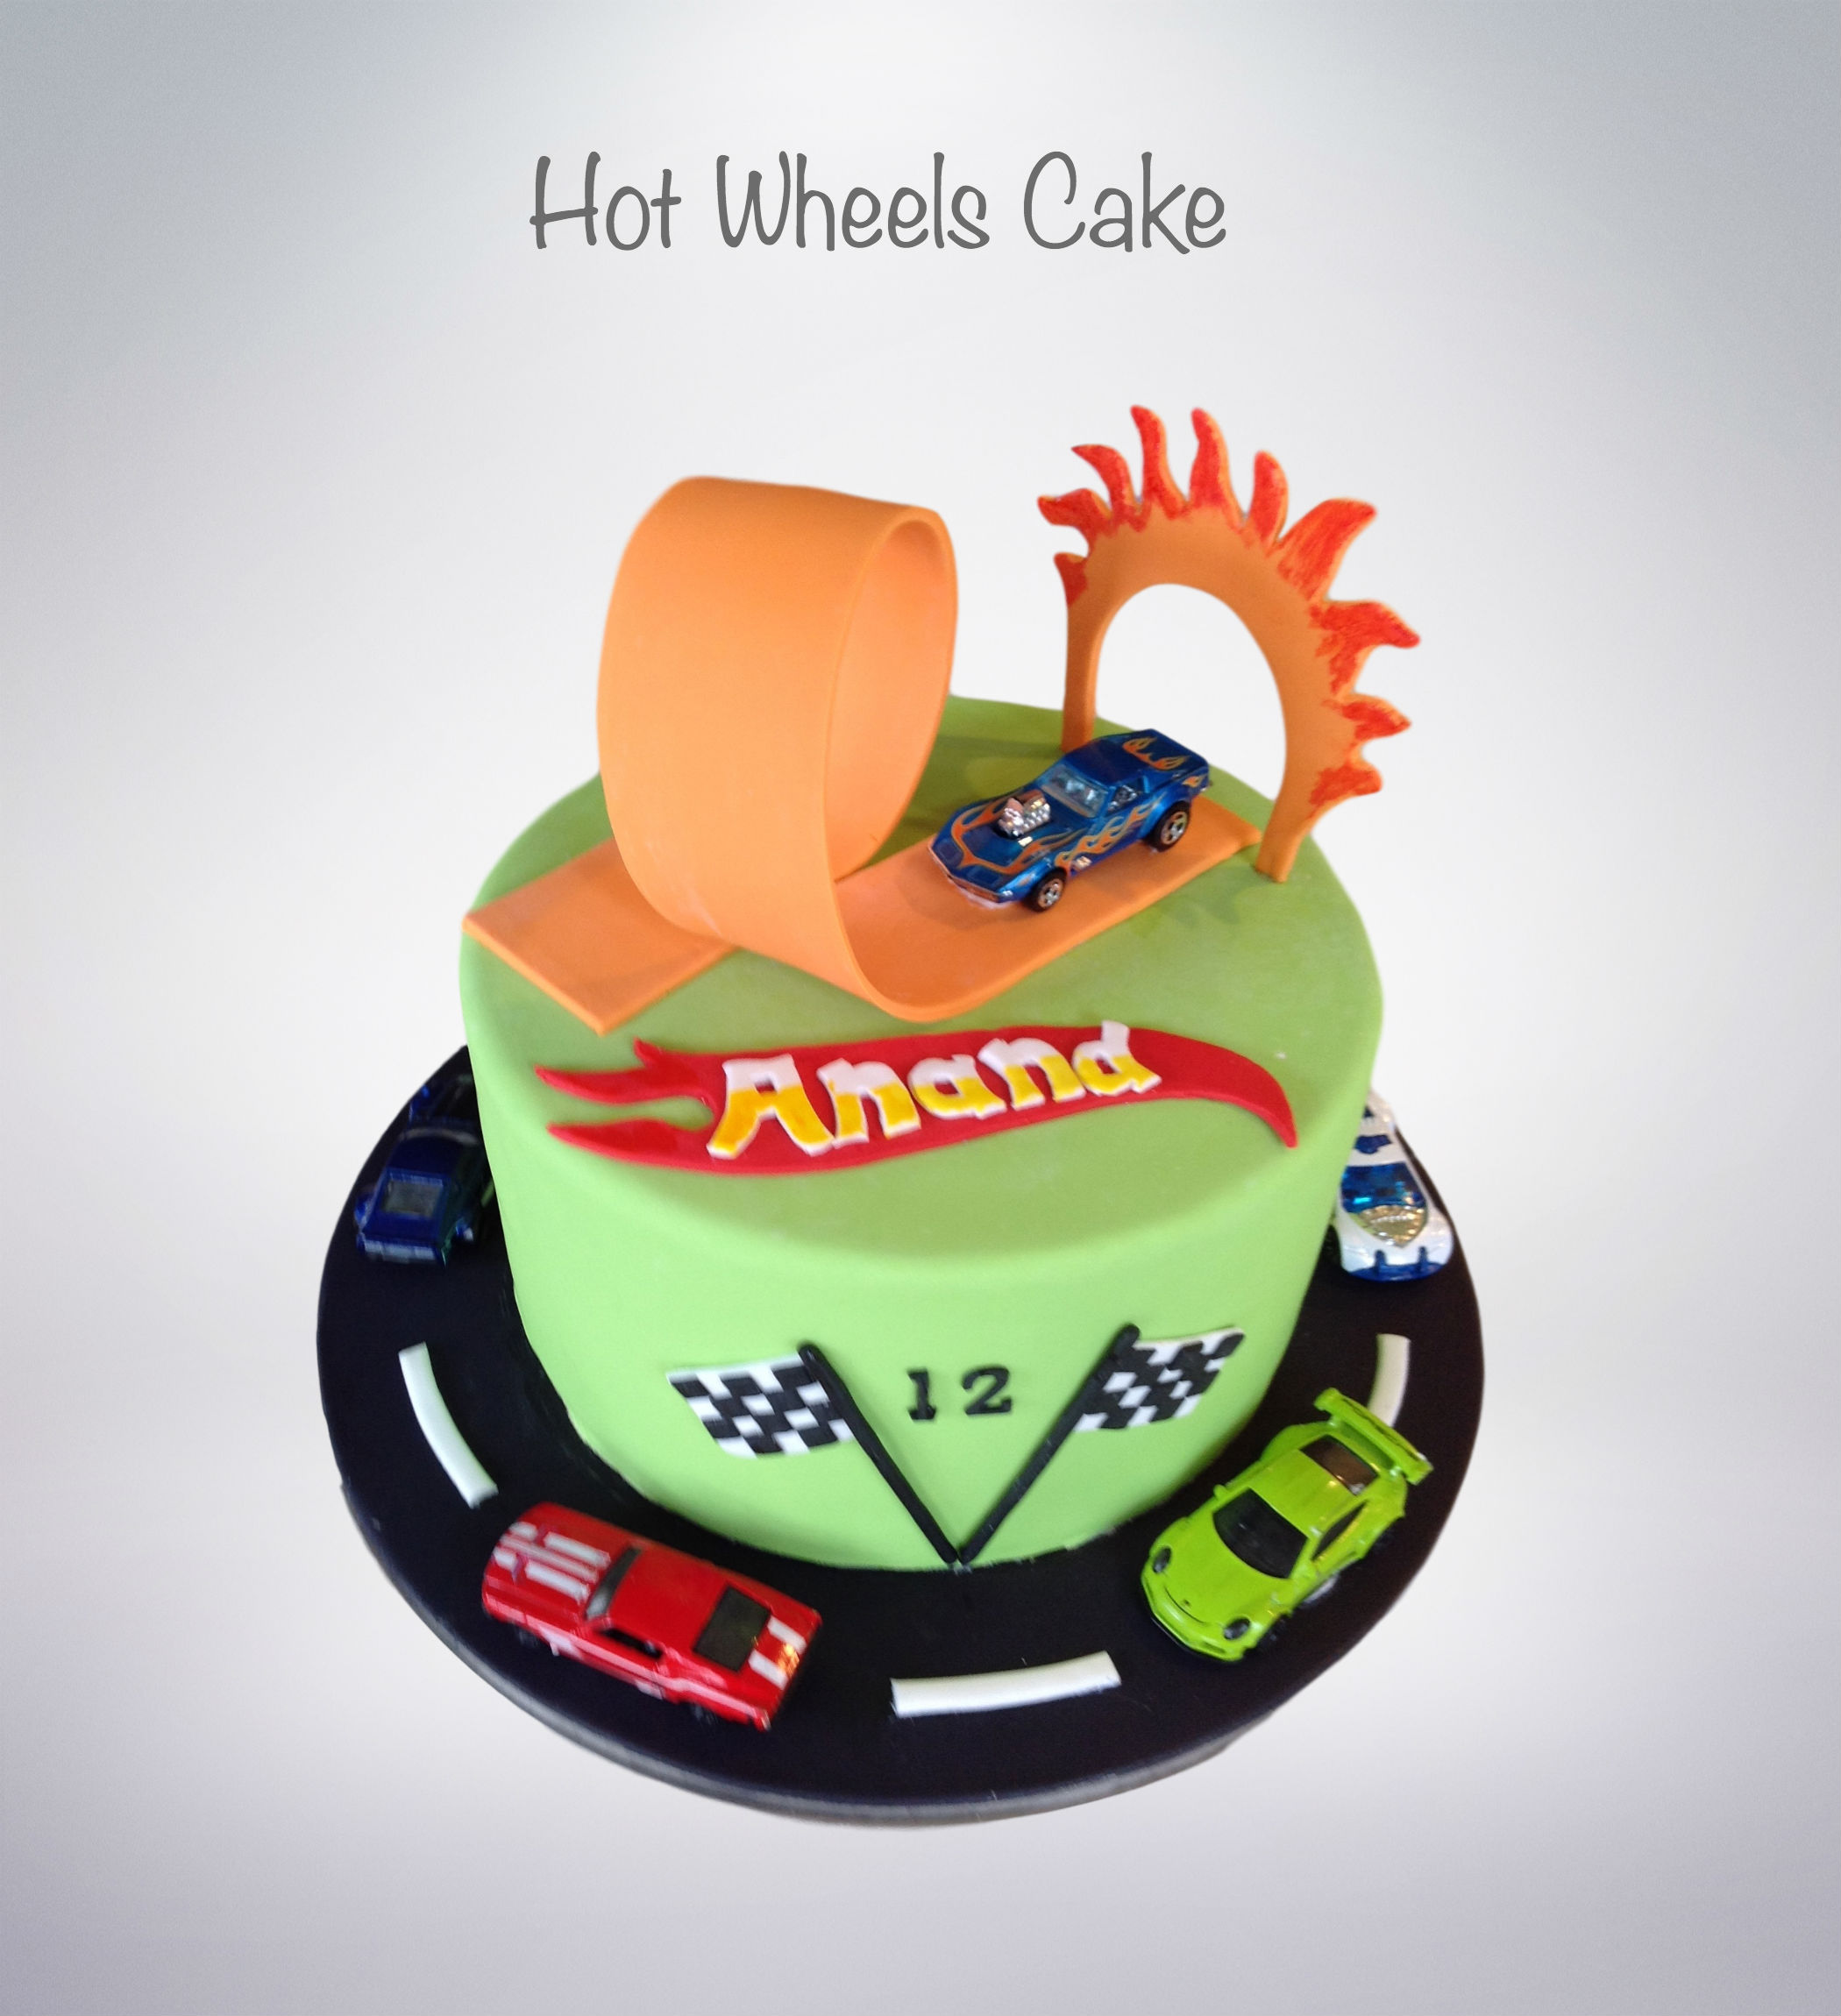 Phenomenal Hot Wheels Cake Cake Celebrations Monroe Ny 845 418 3431 Funny Birthday Cards Online Chimdamsfinfo